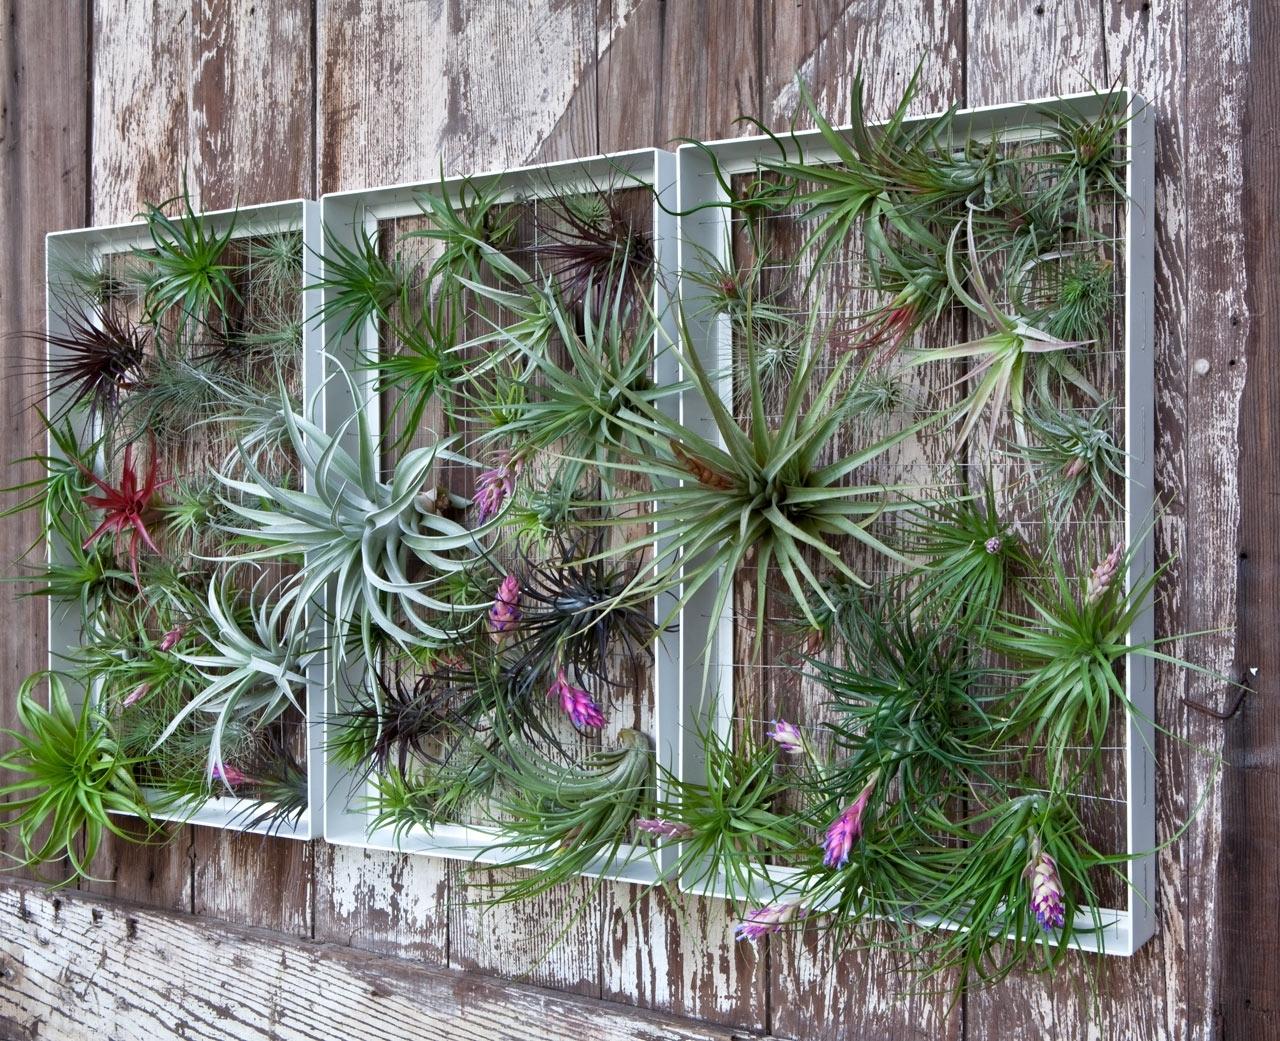 Living Wall Art Vertical Garden Framesairplantman – Design Milk Within Favorite Garden Wall Art (View 6 of 15)